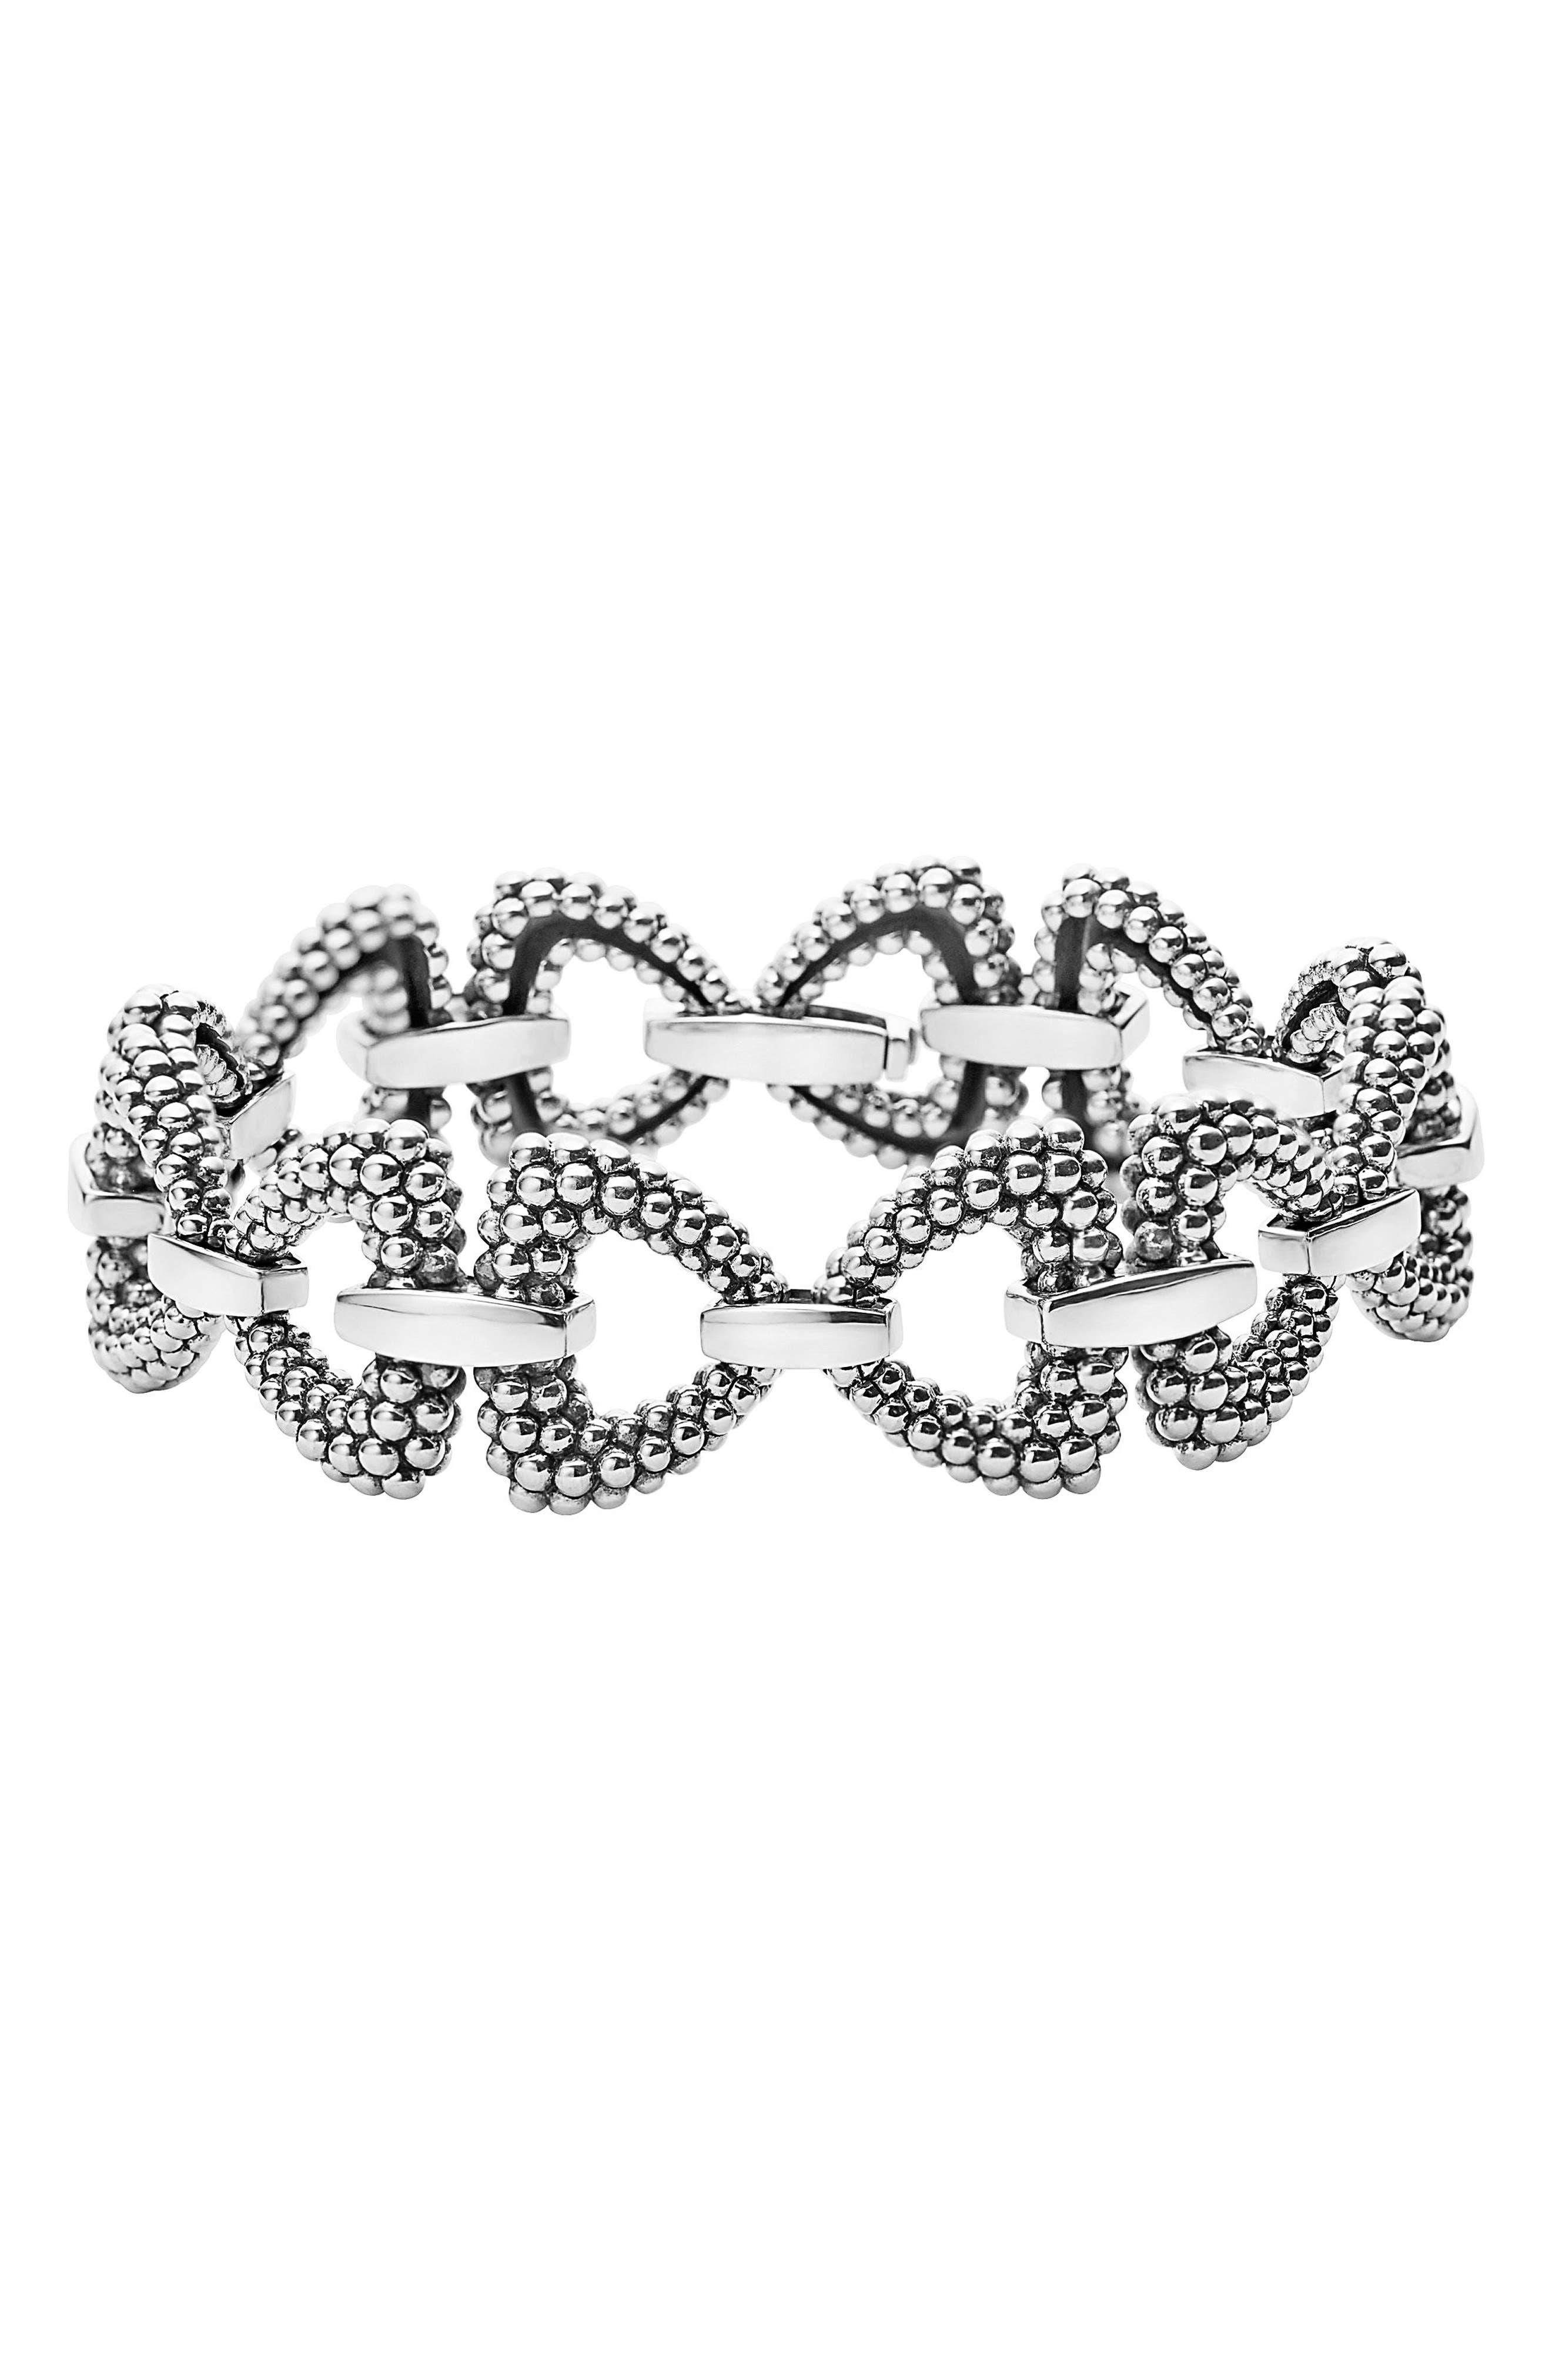 Derby Caviar Connector Link Bracelet,                         Main,                         color, Silver